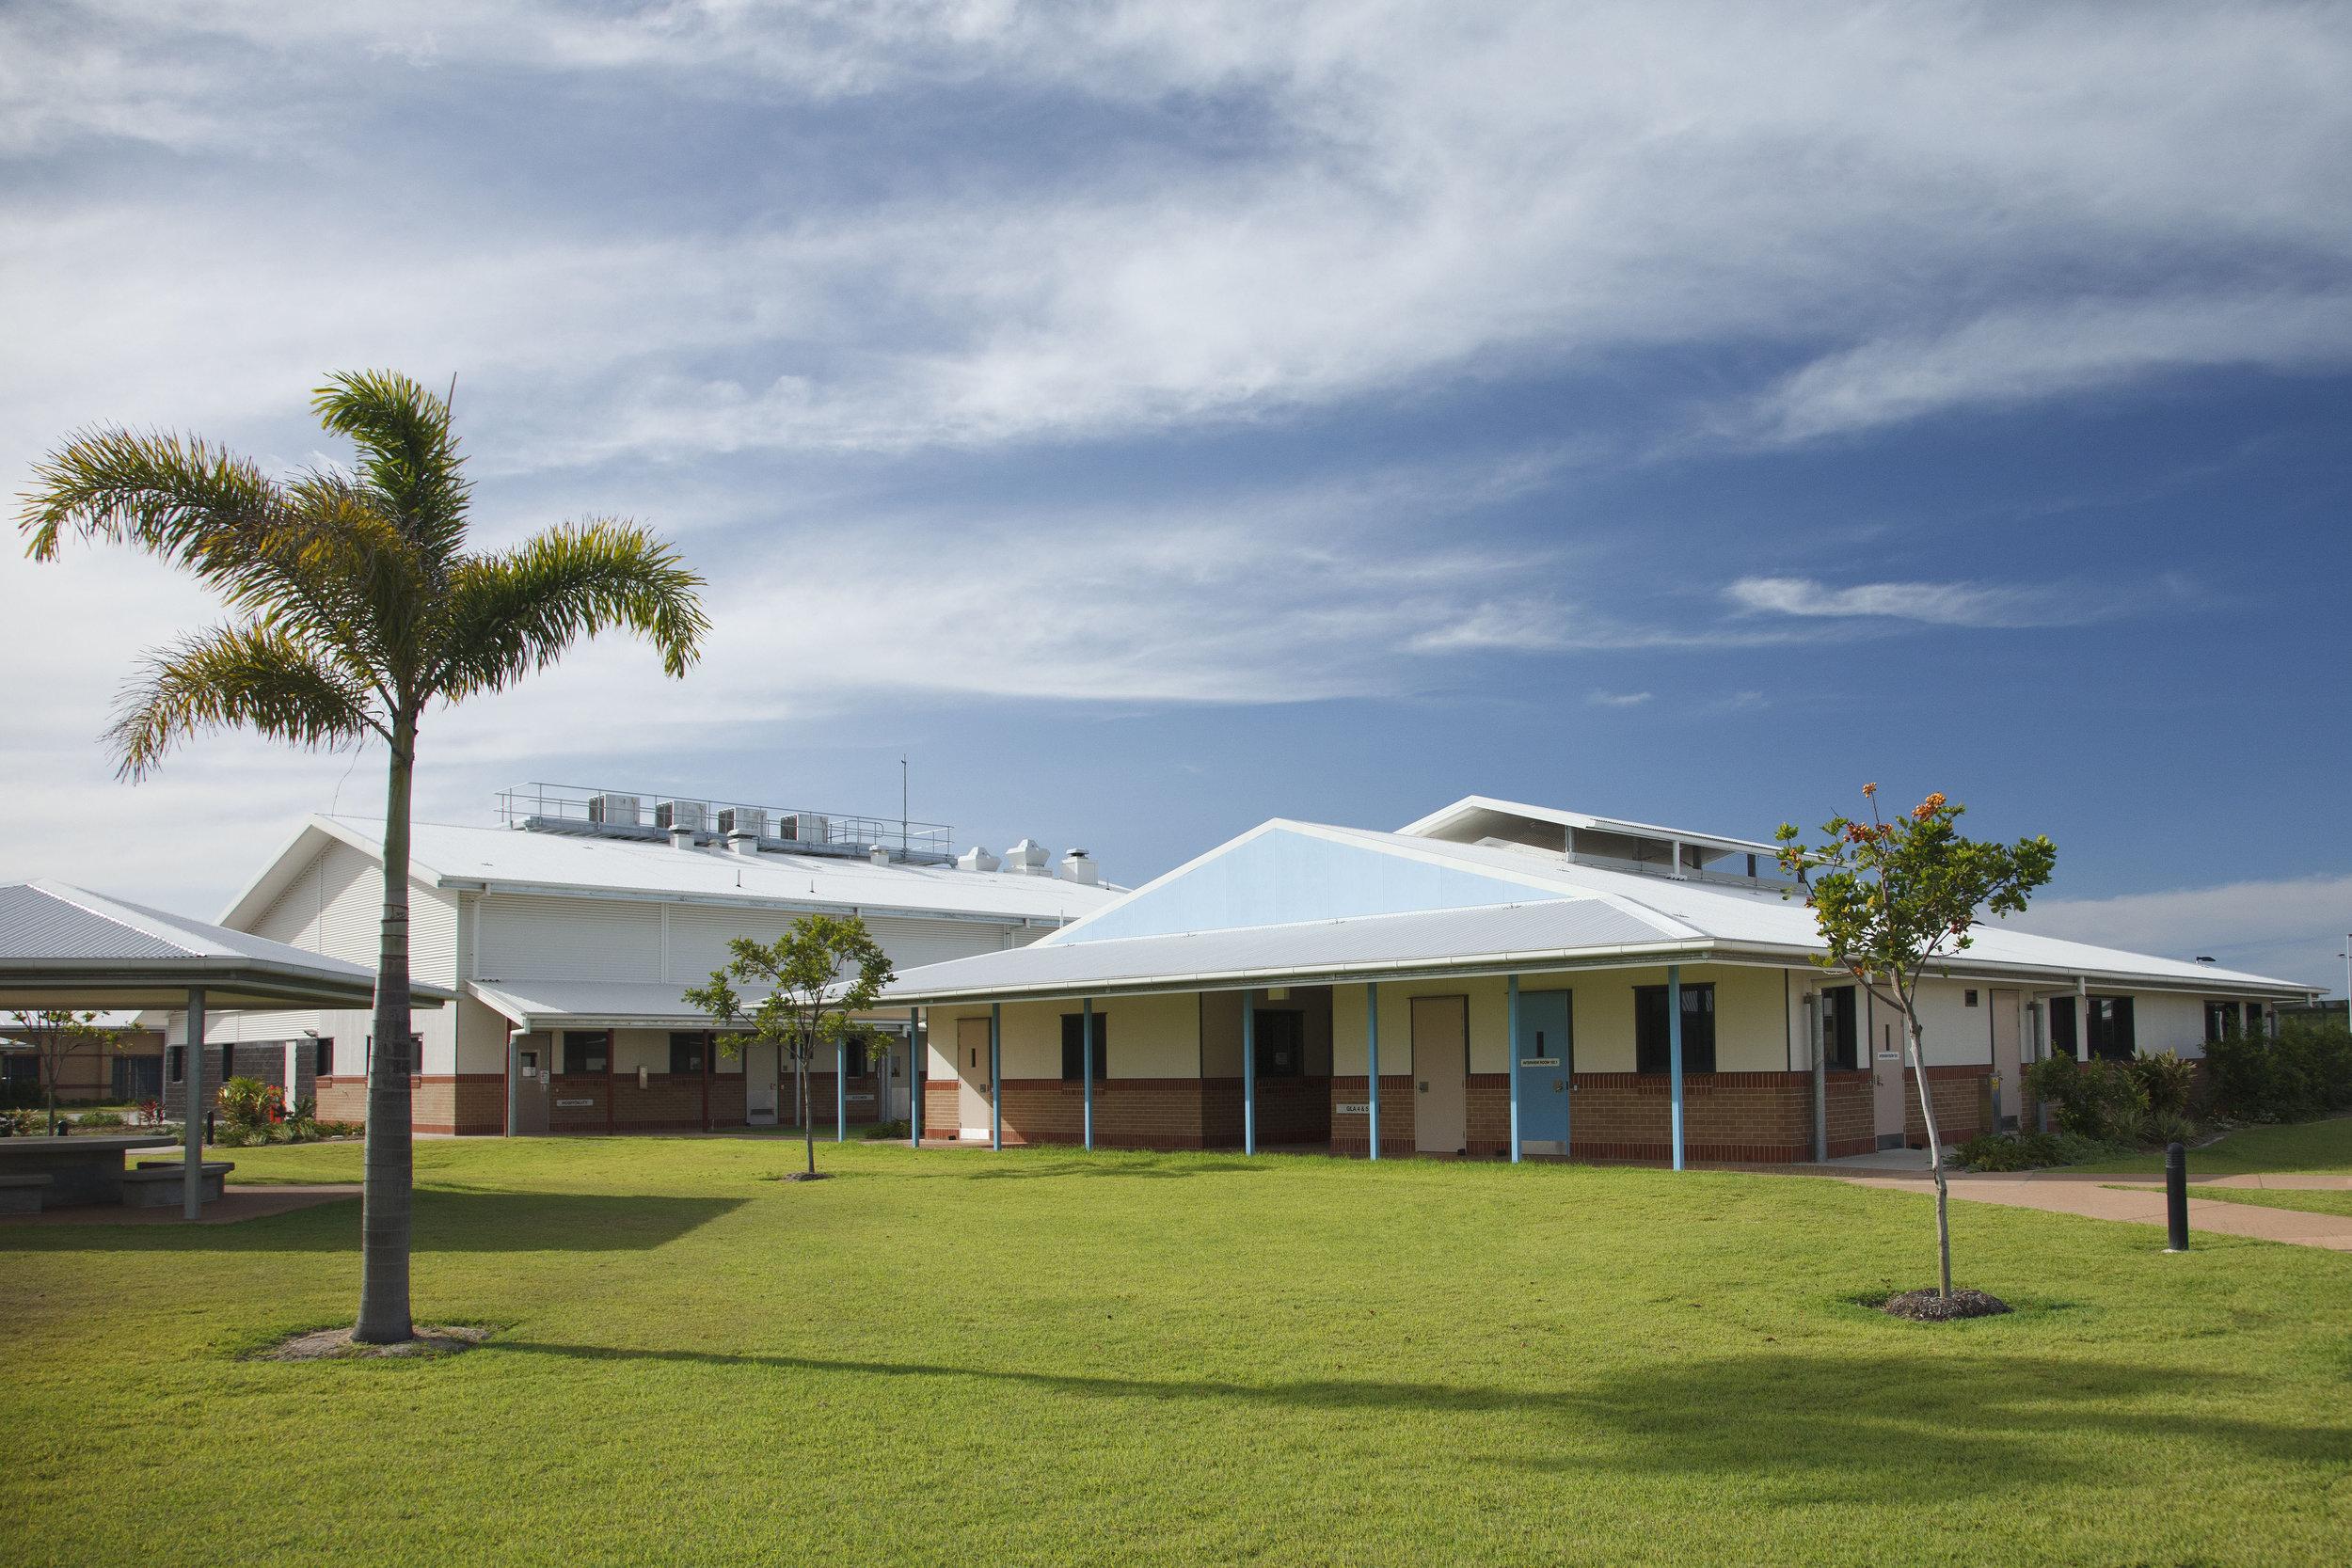 Far-north-qld-youth-detention-guymer-bailey-landscape-2.jpg